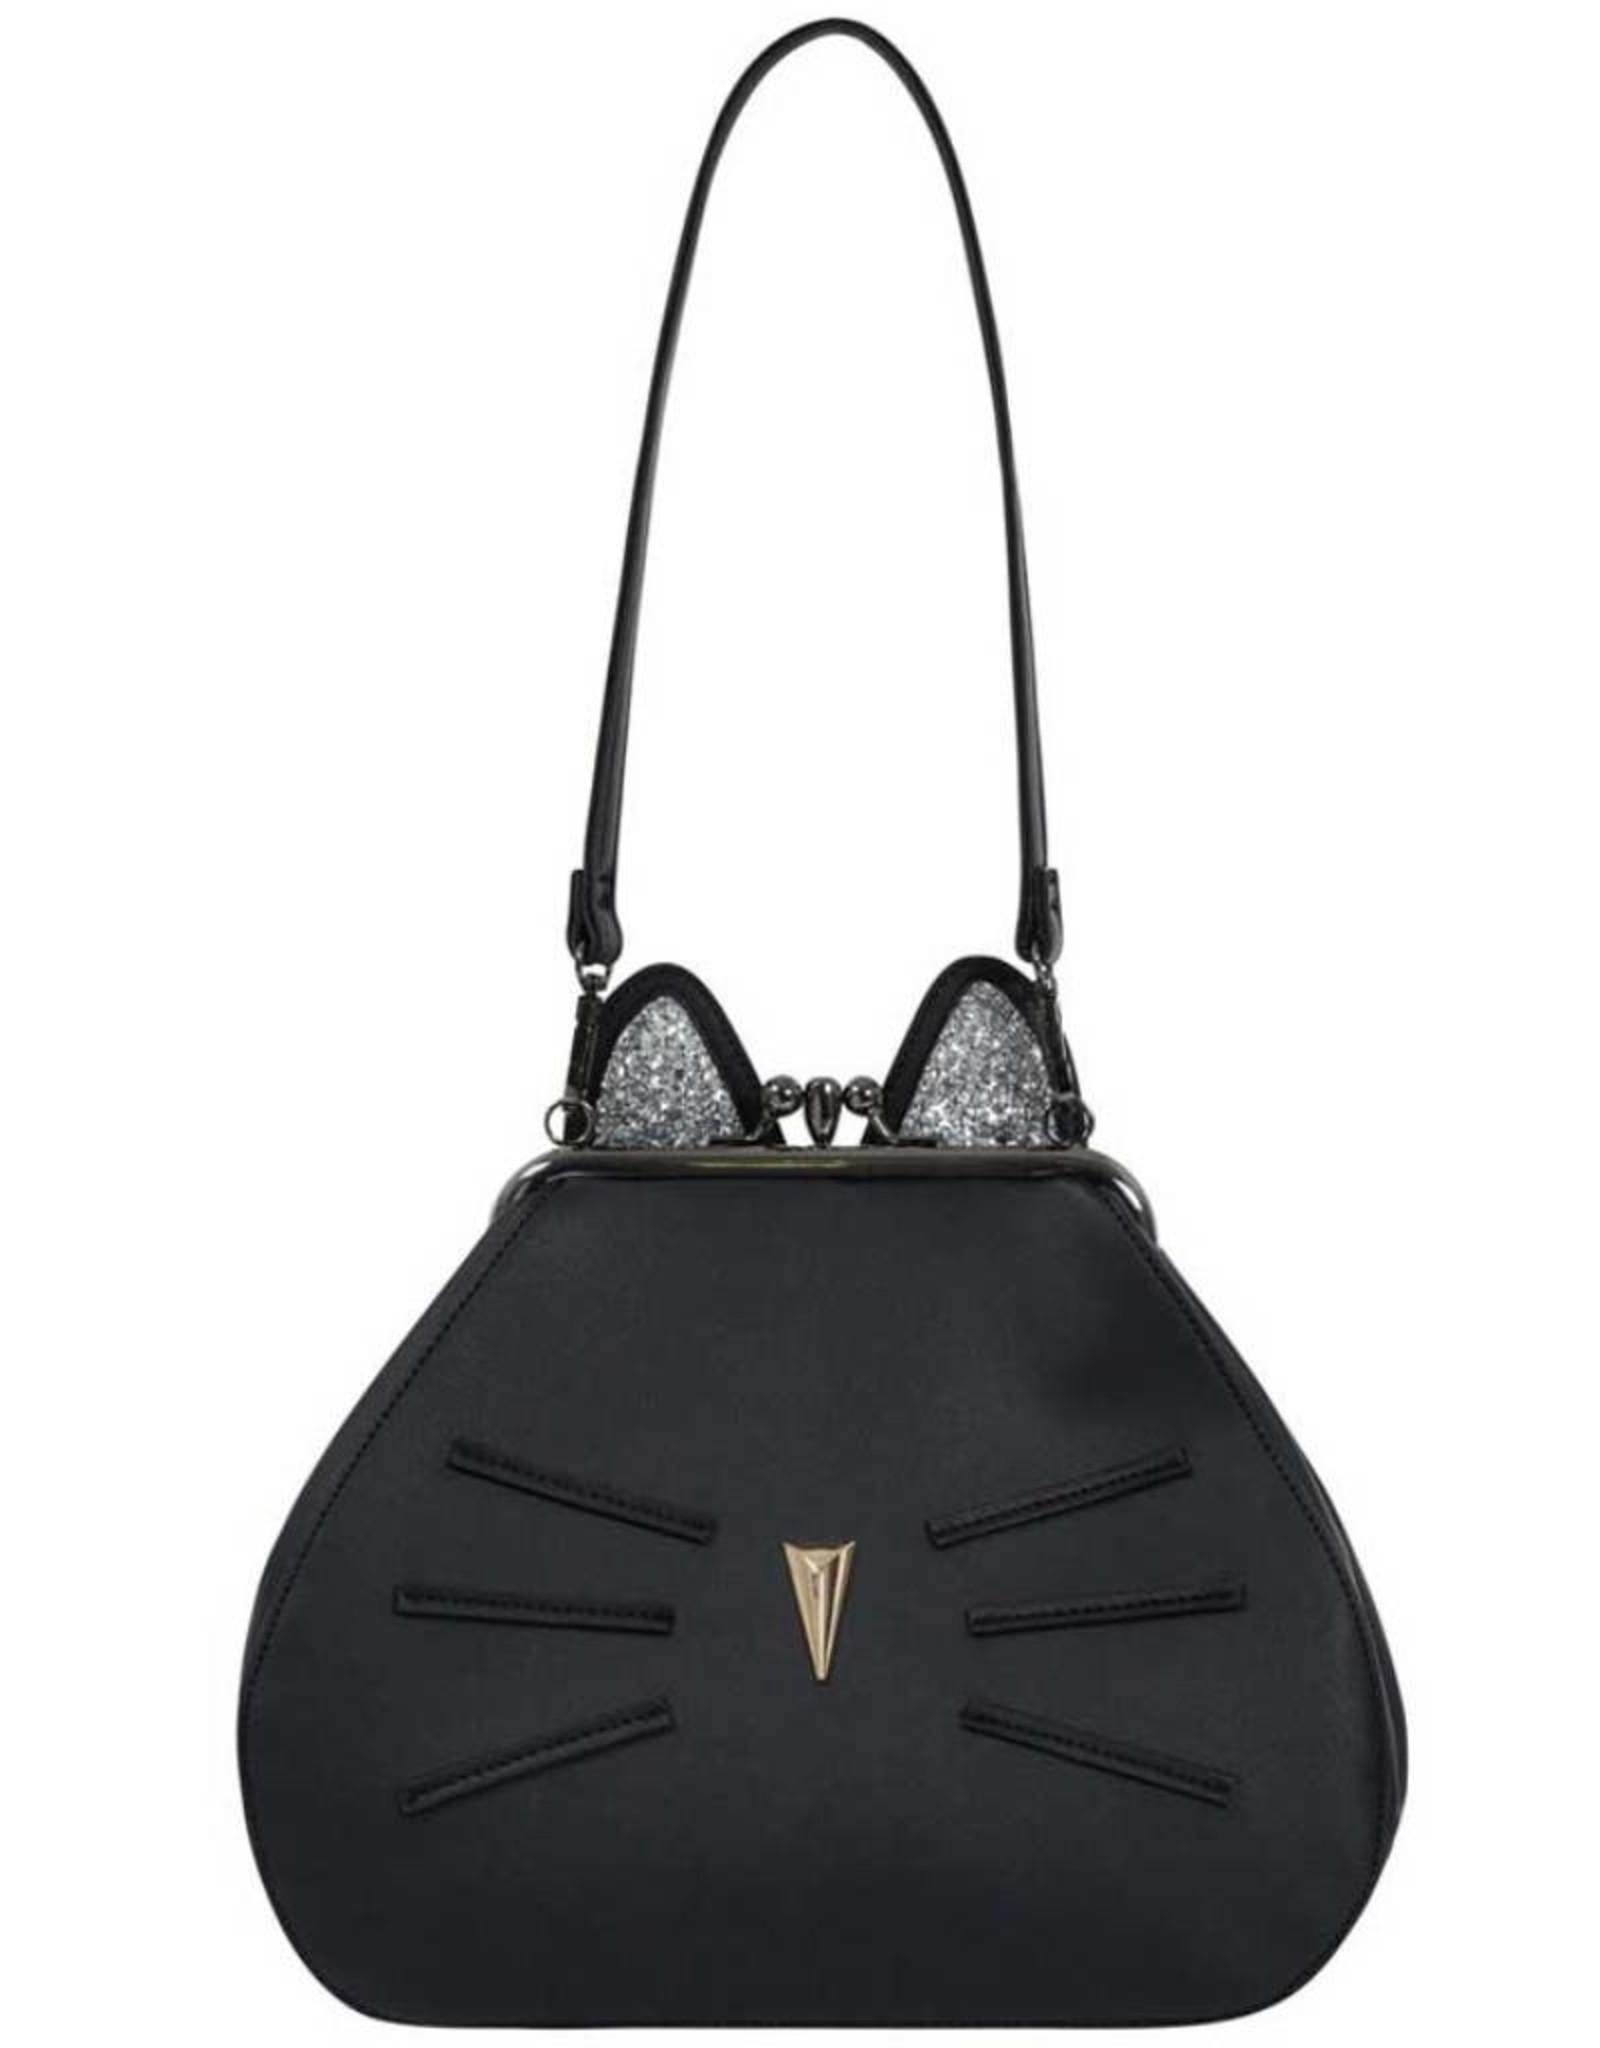 Voodoo Vixen Retro tassen Vintage tassen - Voodoo Vixen Pheobie Black Kitty schoudertas